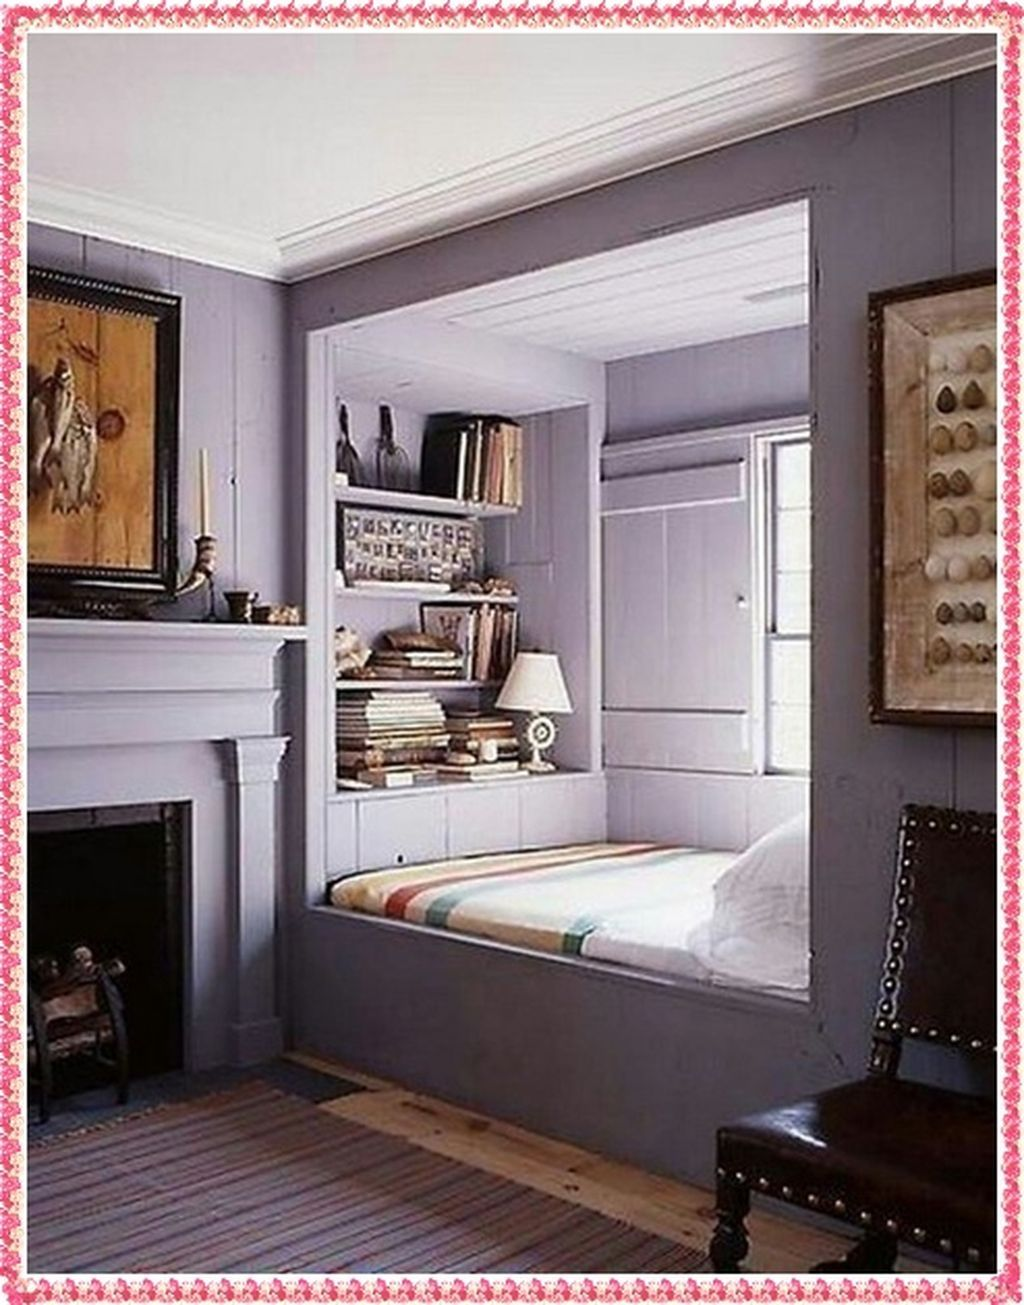 Decorating bedroom simple  stylish and original barn bedroom design ideas  barn bedrooms